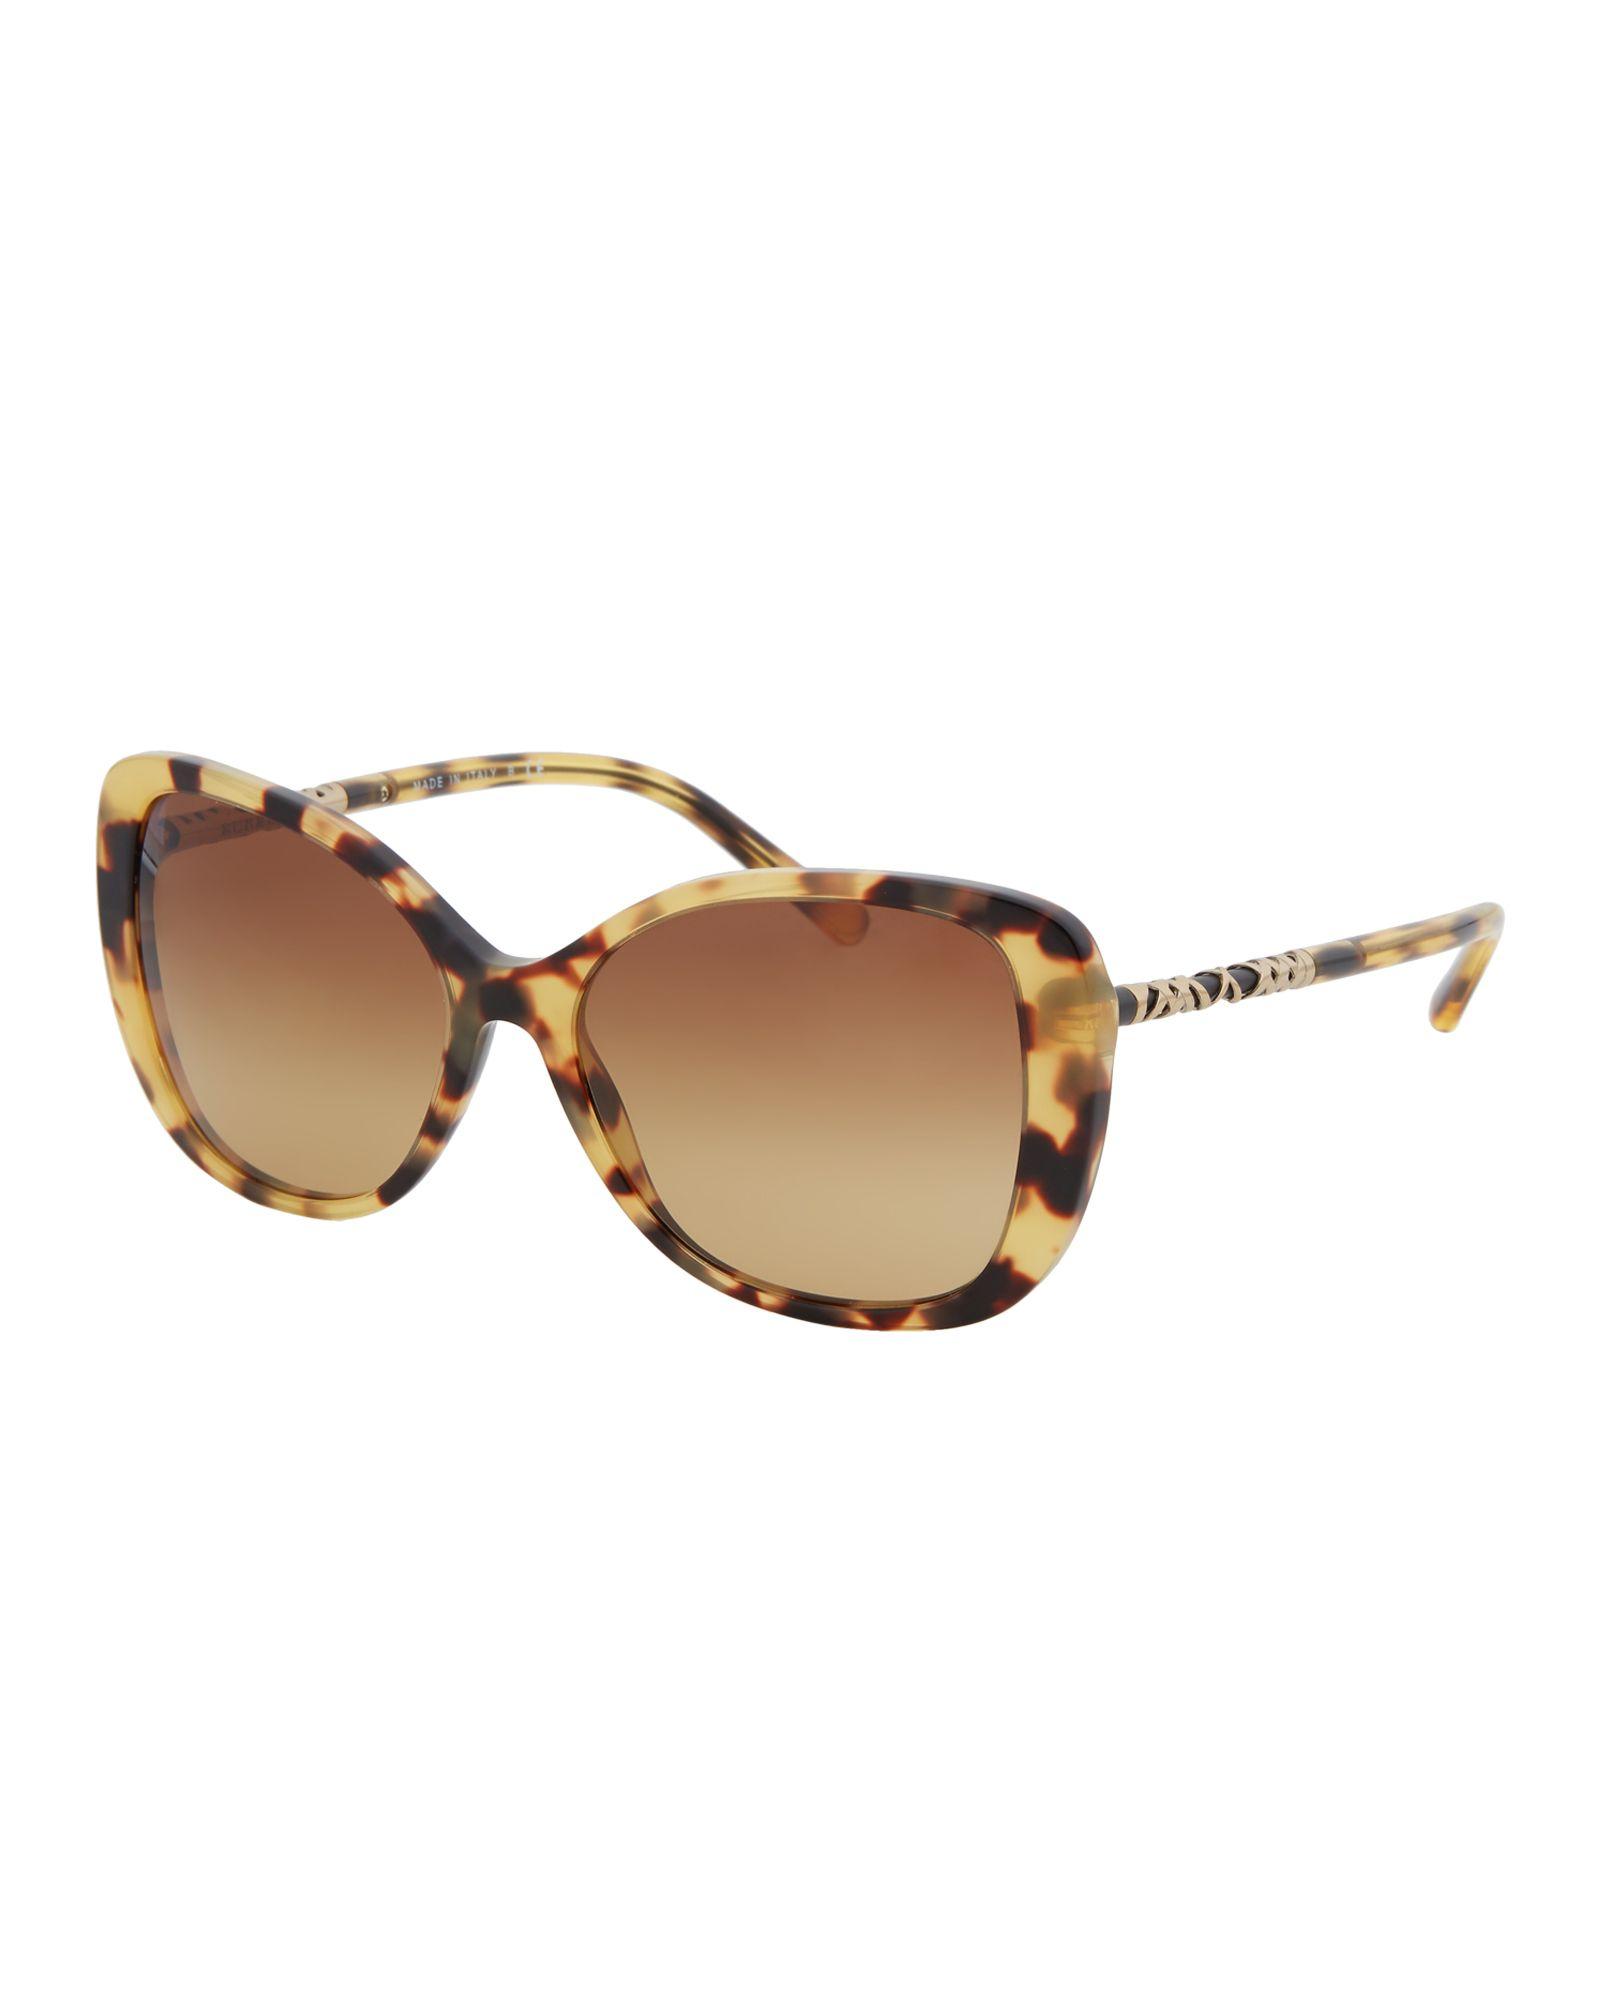 ae73546c2523 Burberry B 4238 Tortoiseshell-Look Butterfly Sunglasses